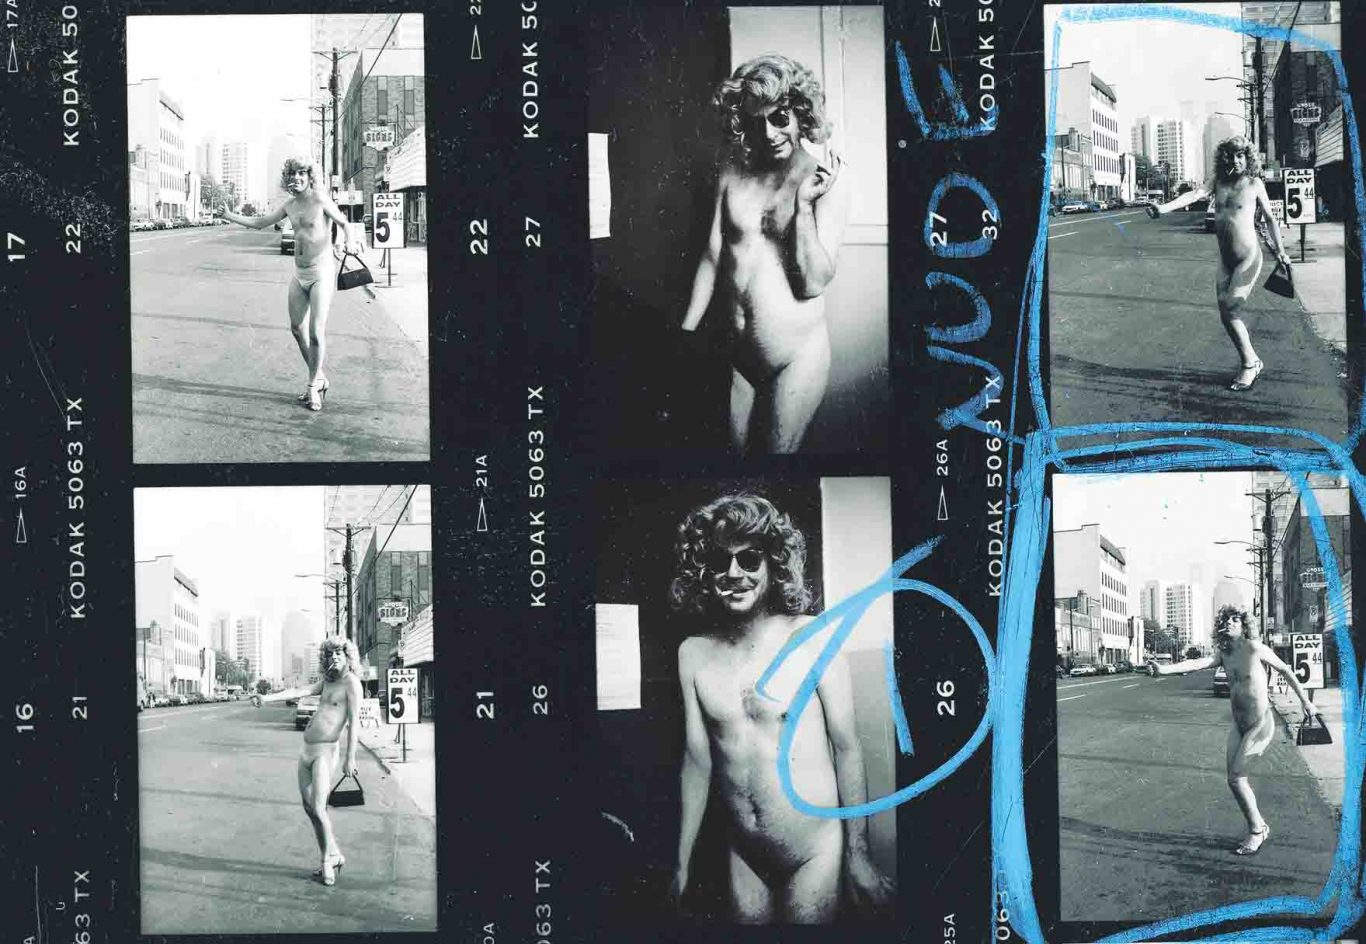 Village Voice article about Madonna's SEX book